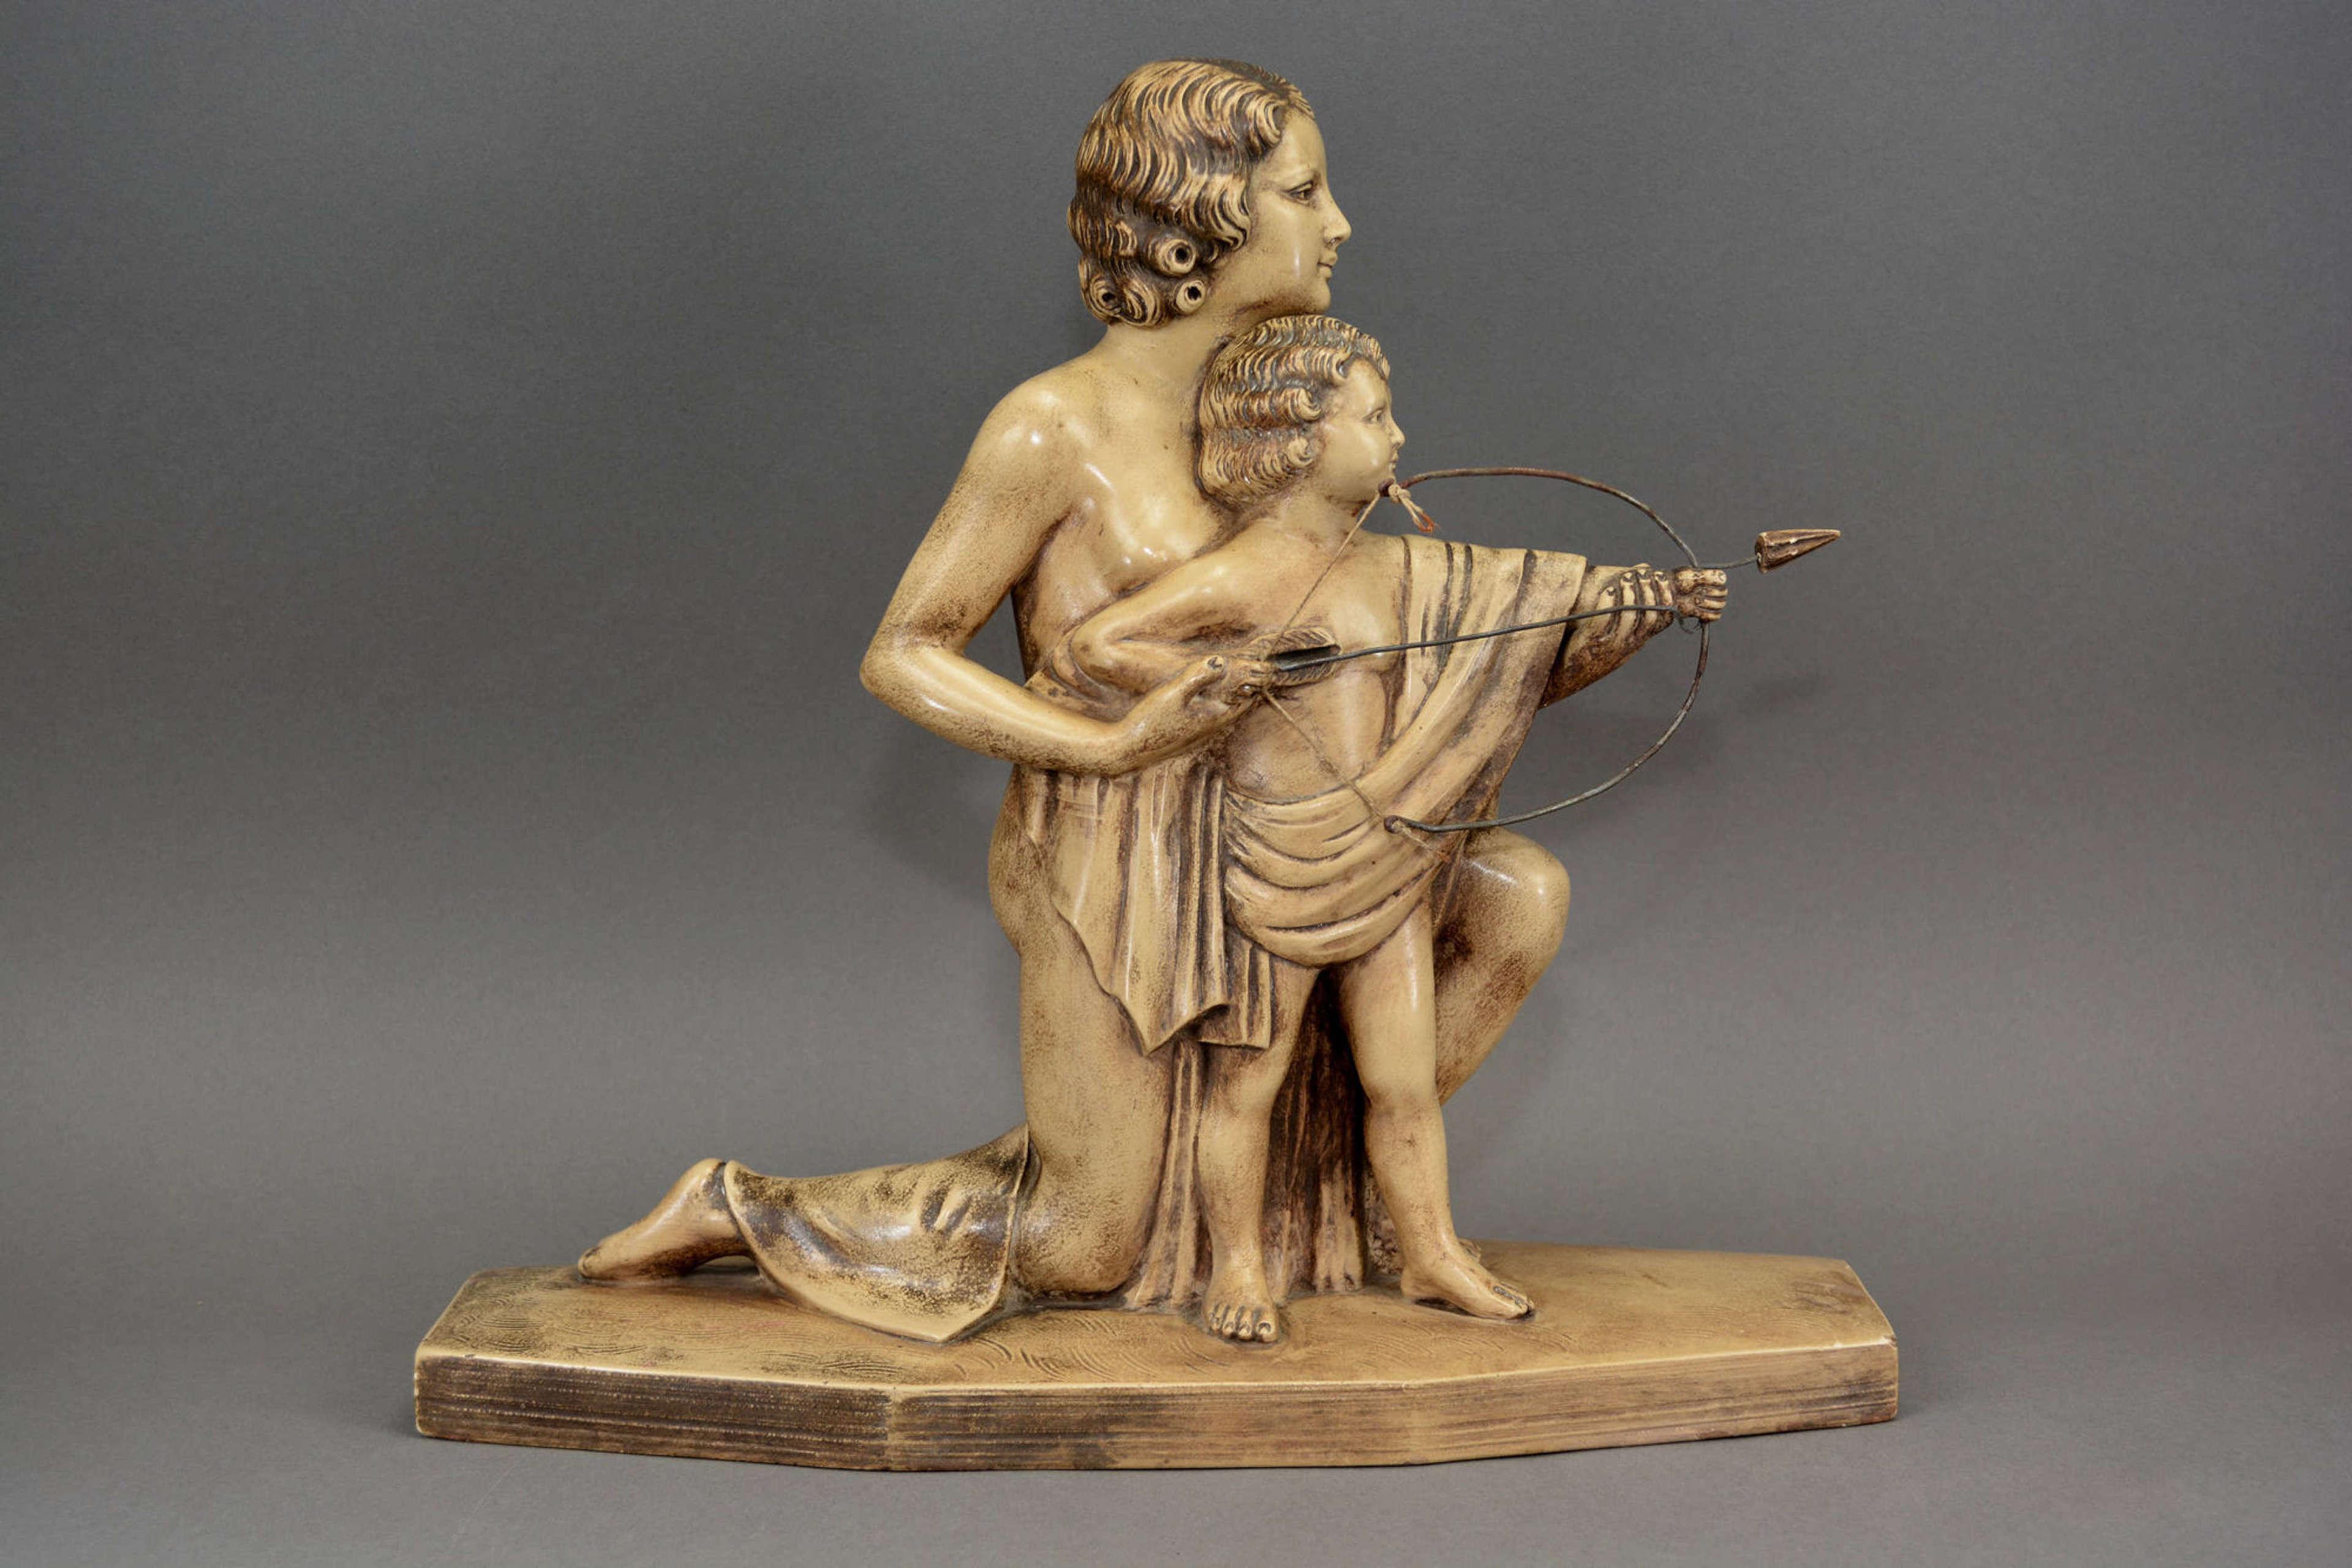 Antique Art Deco bisque sculpture of mother and child